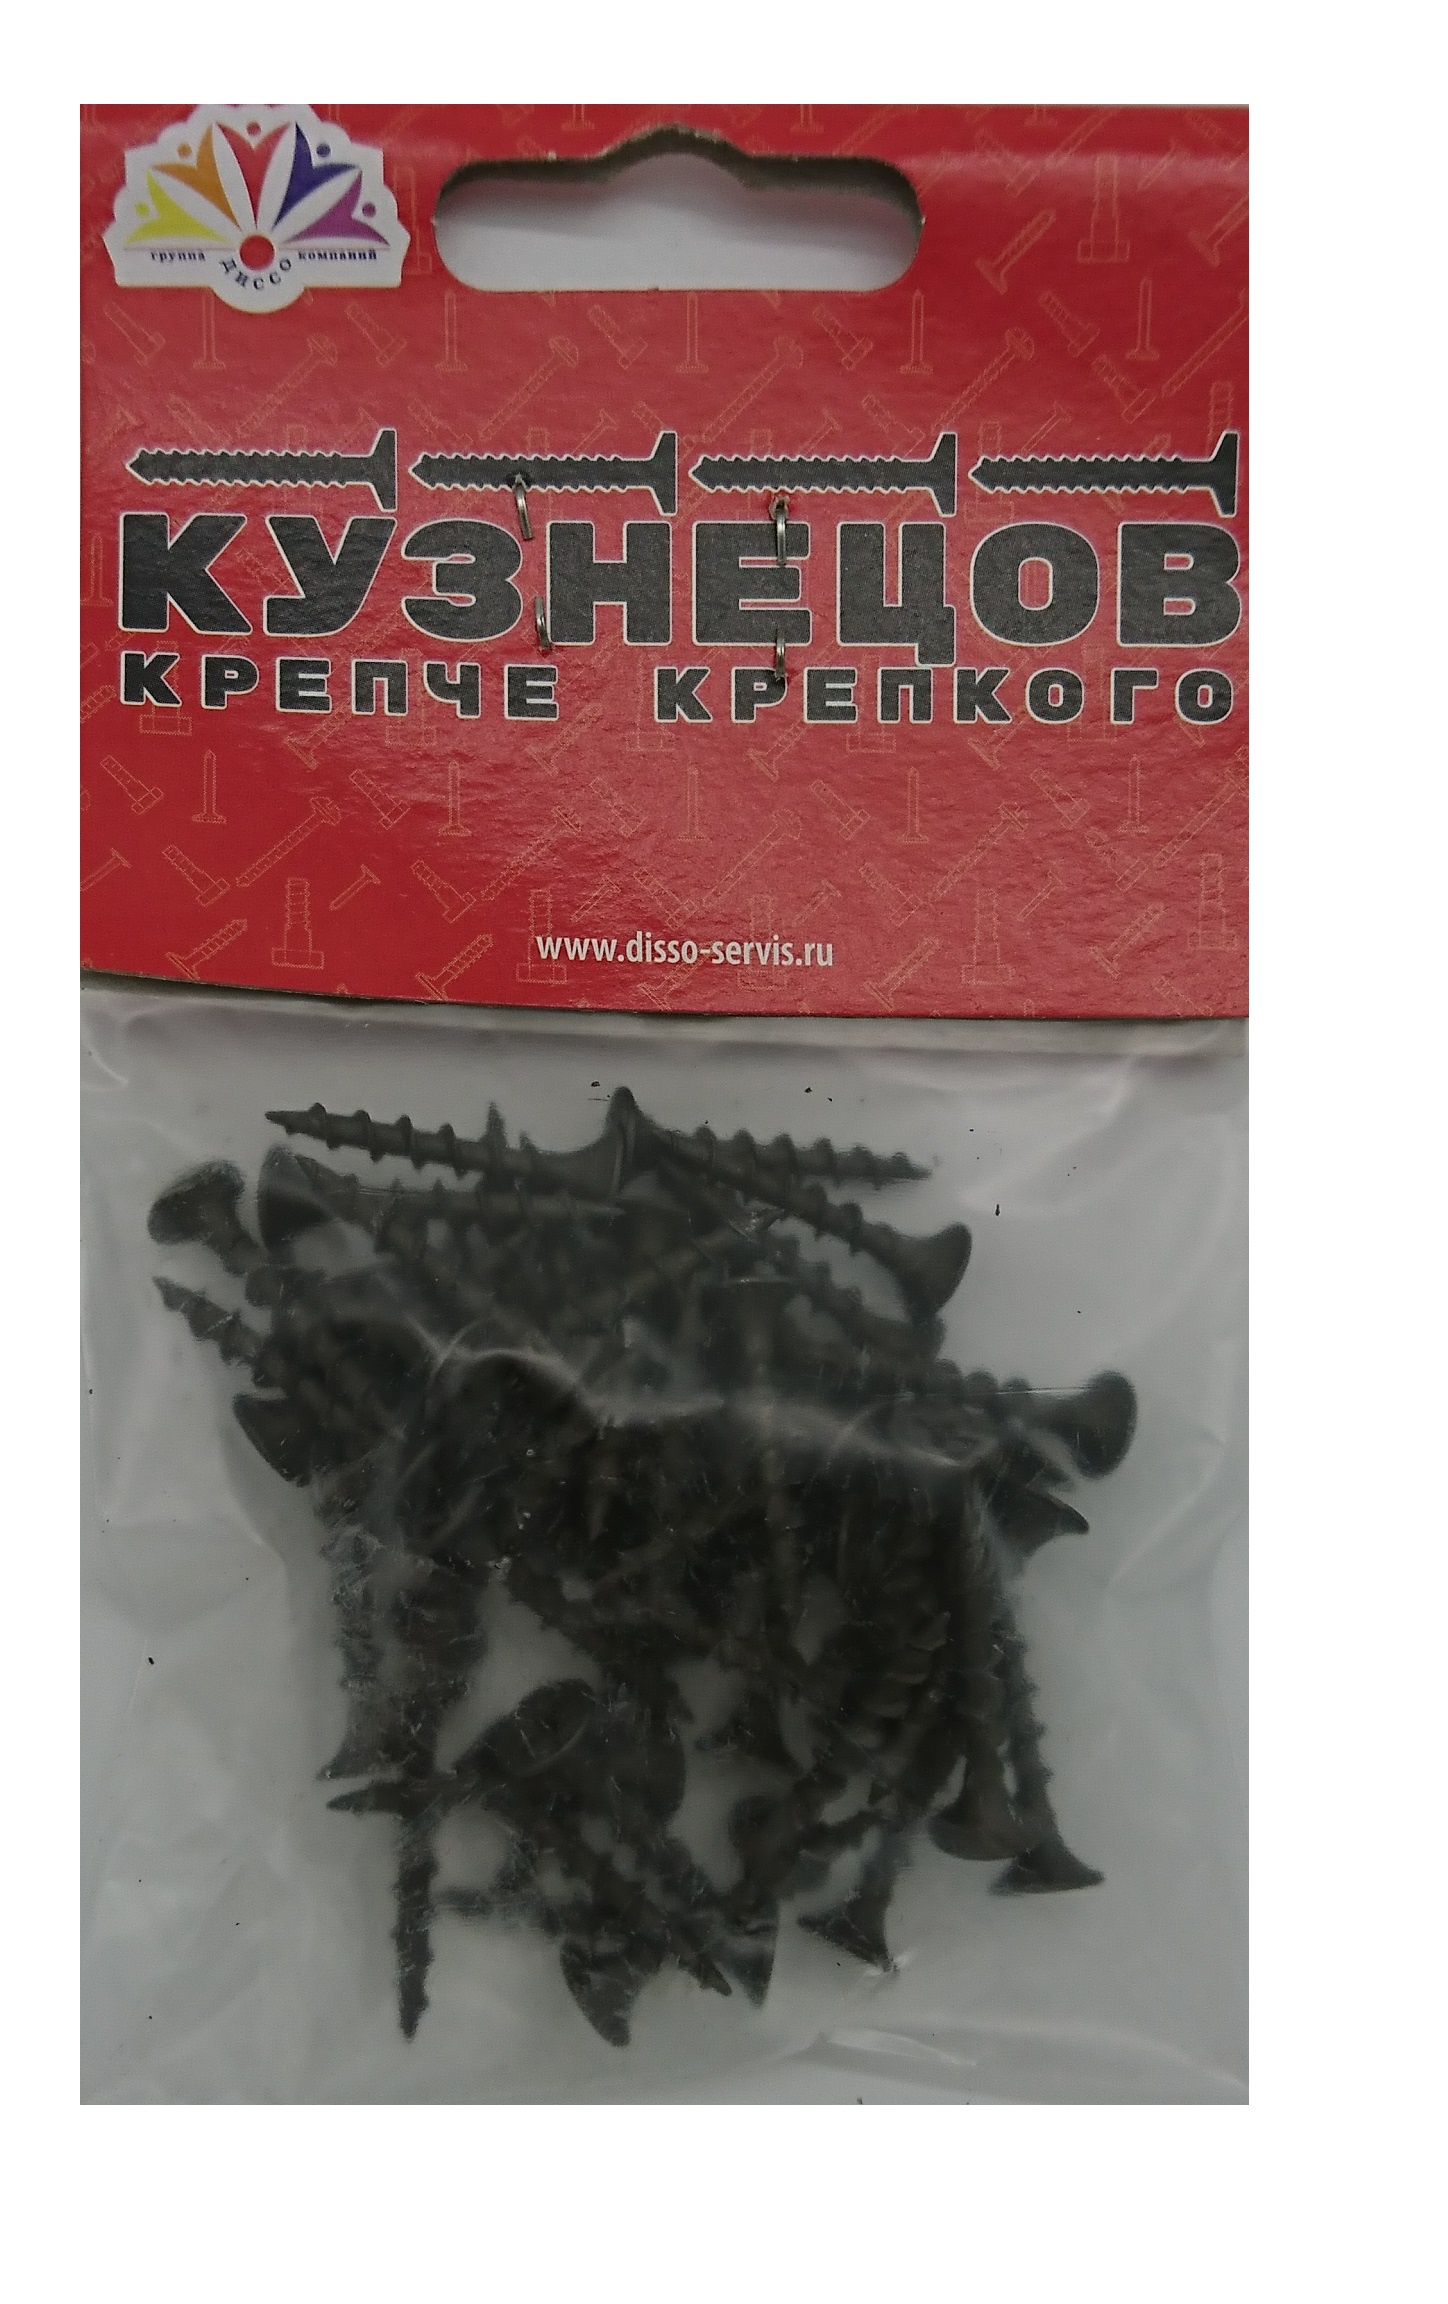 все цены на Саморез Кузнецов гипсокартон-дерево 3,5х25 (50 шт. в упаковке) онлайн